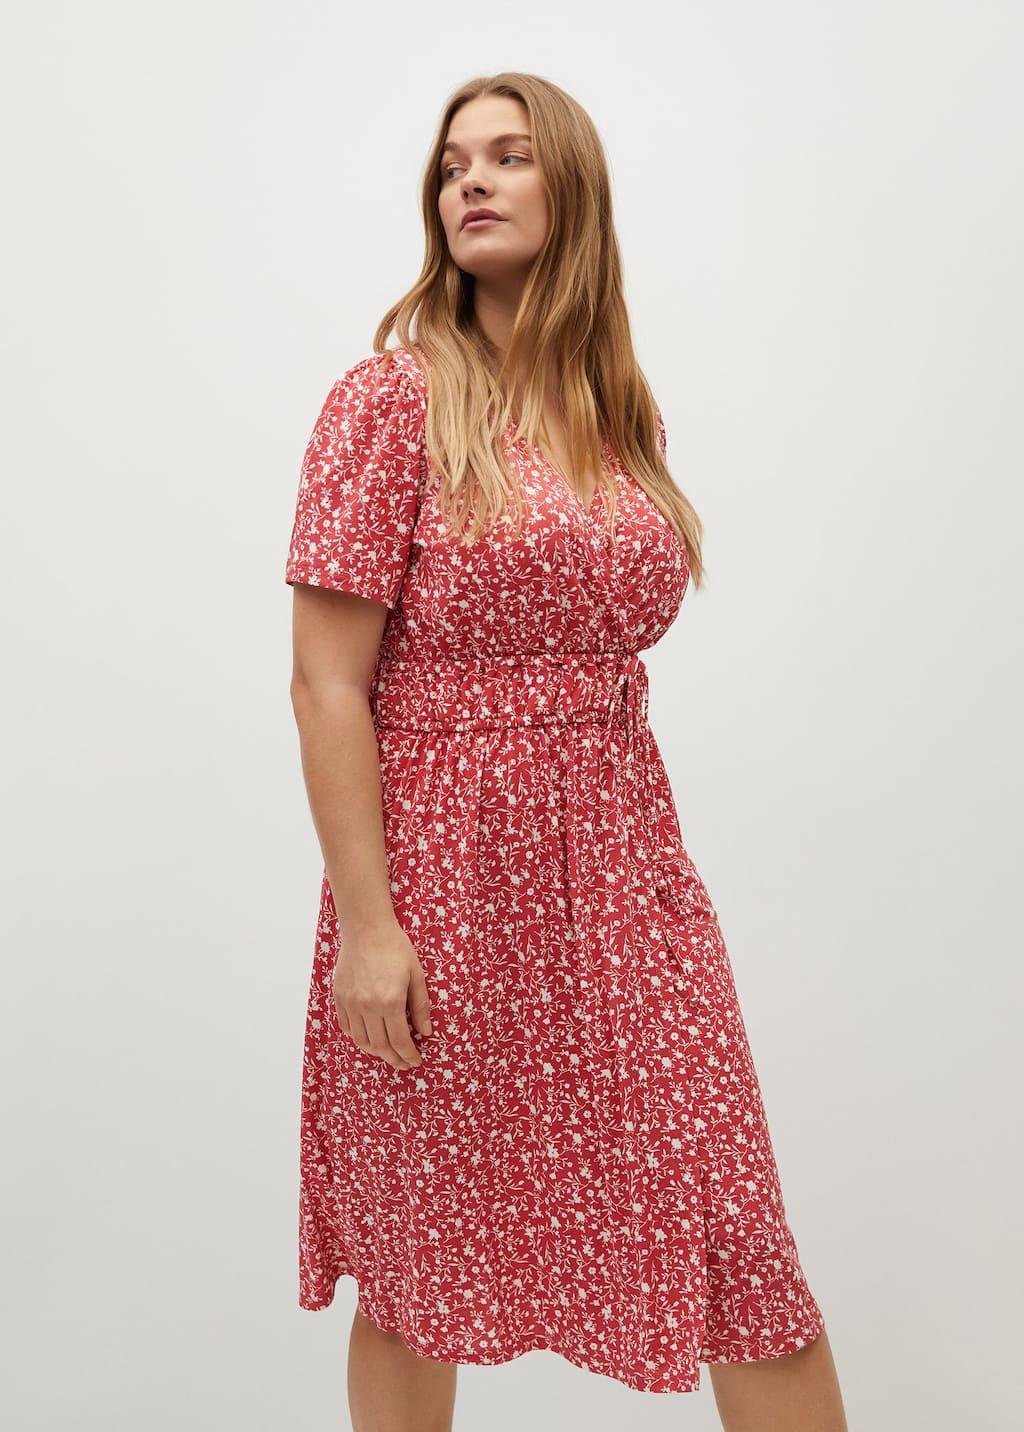 Print wrap dress - Medium plane